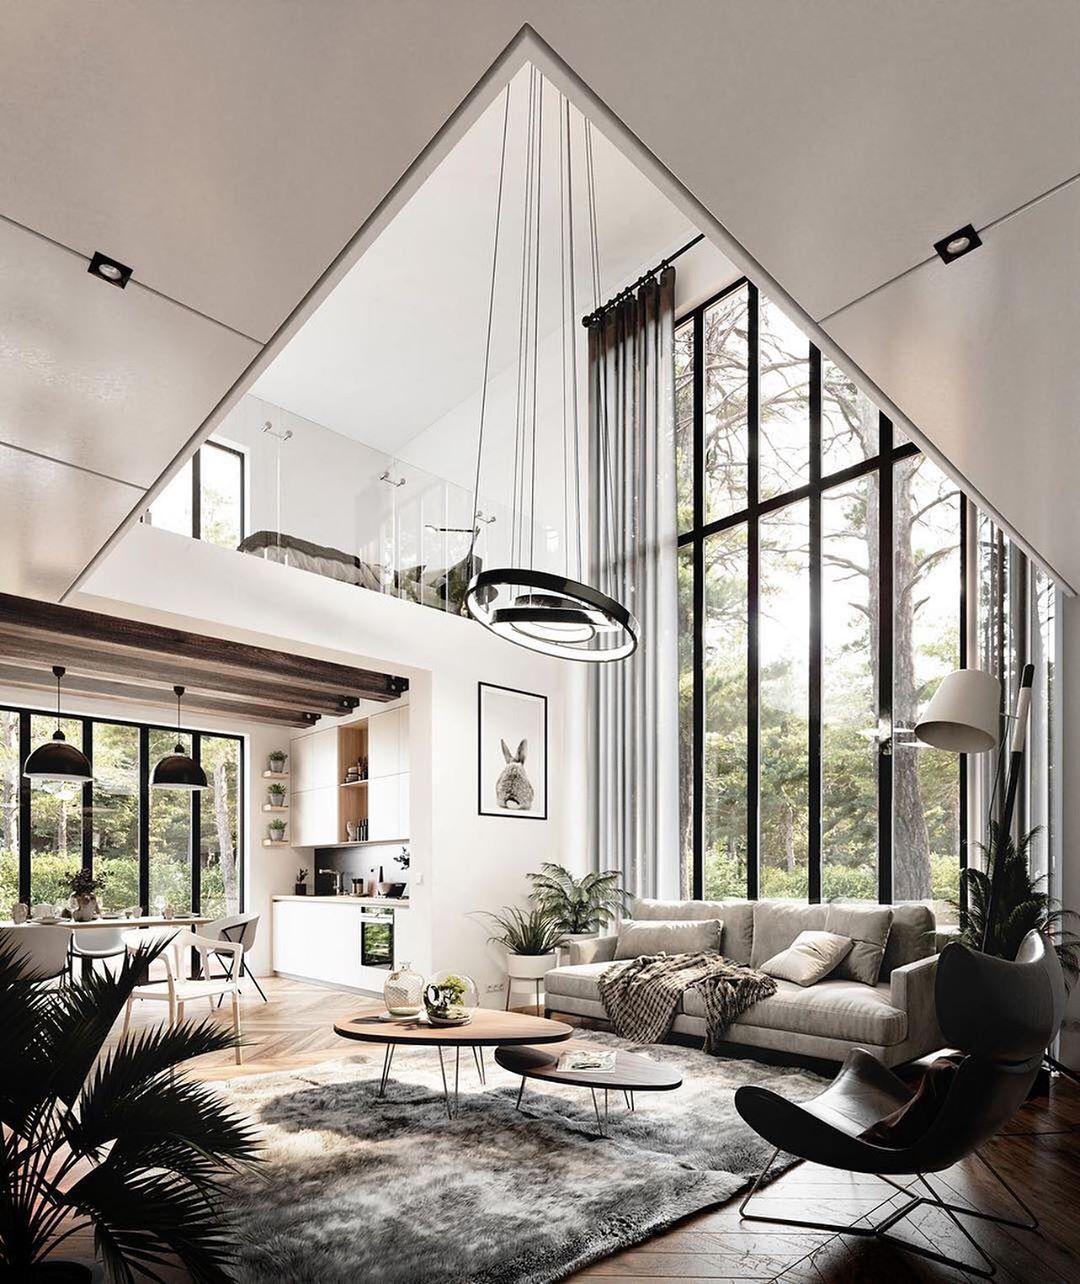 interior decor trends 2020 (12)